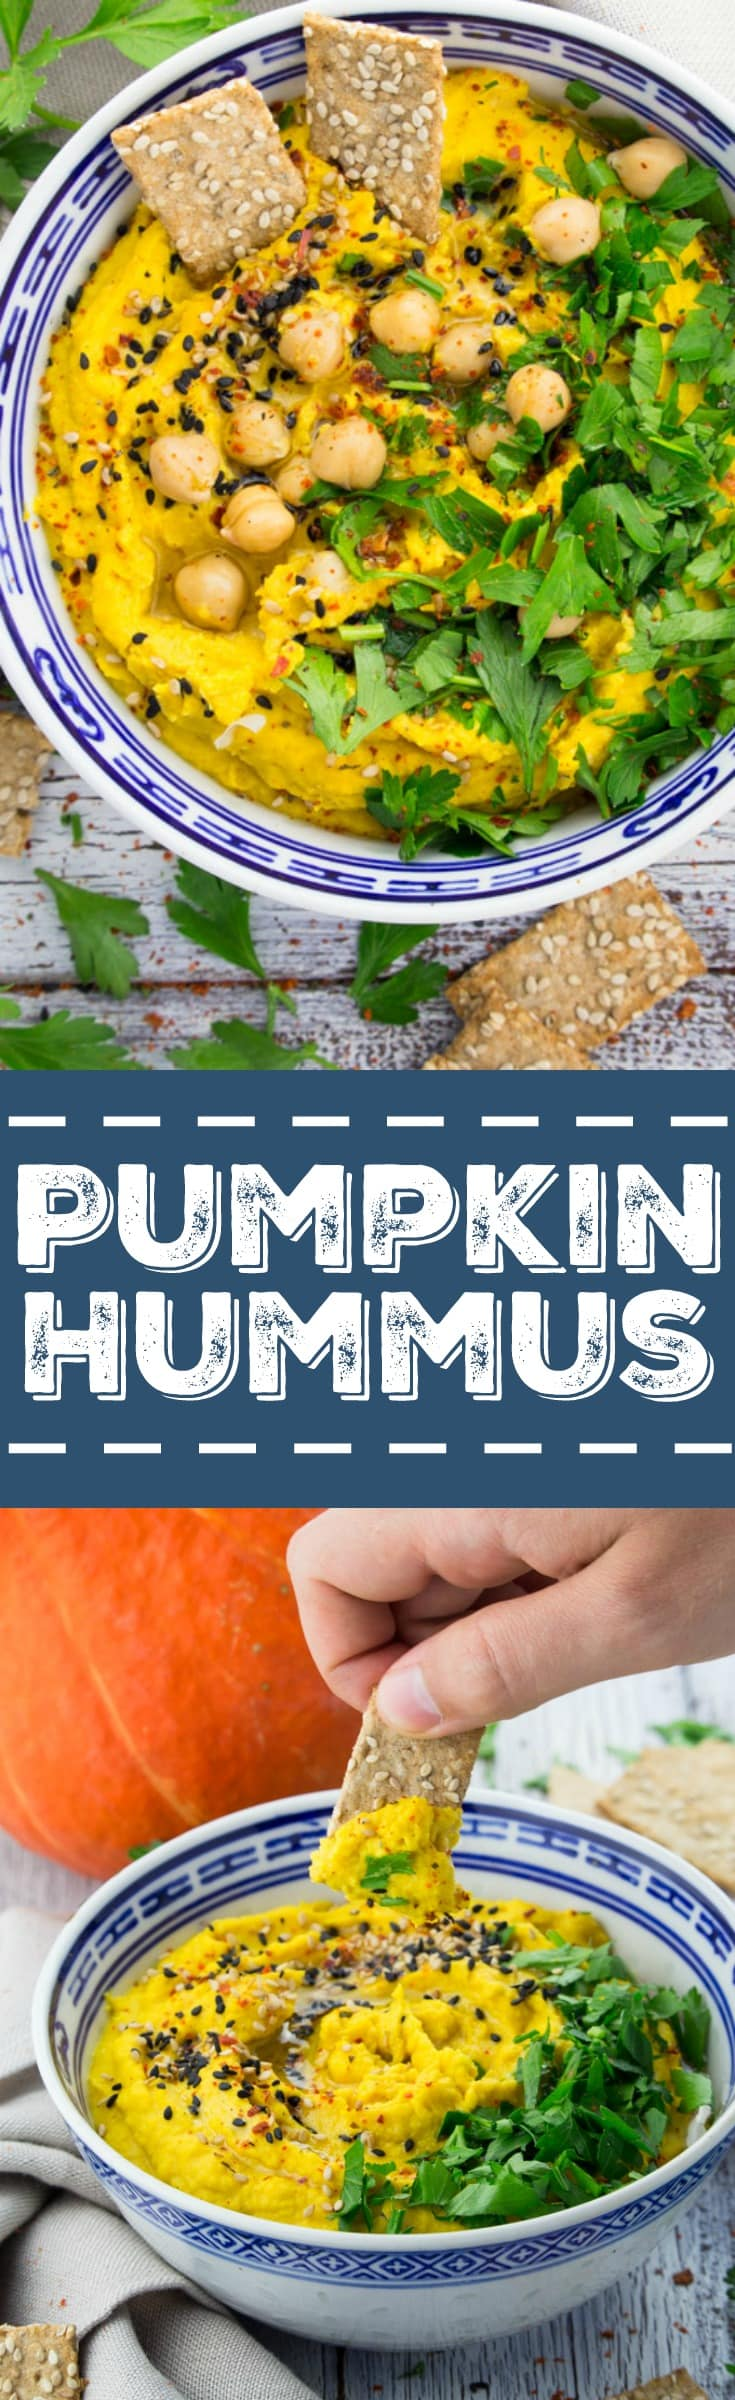 recipe pumpkin hummus servings ingredients for the pumpkin hummus ...